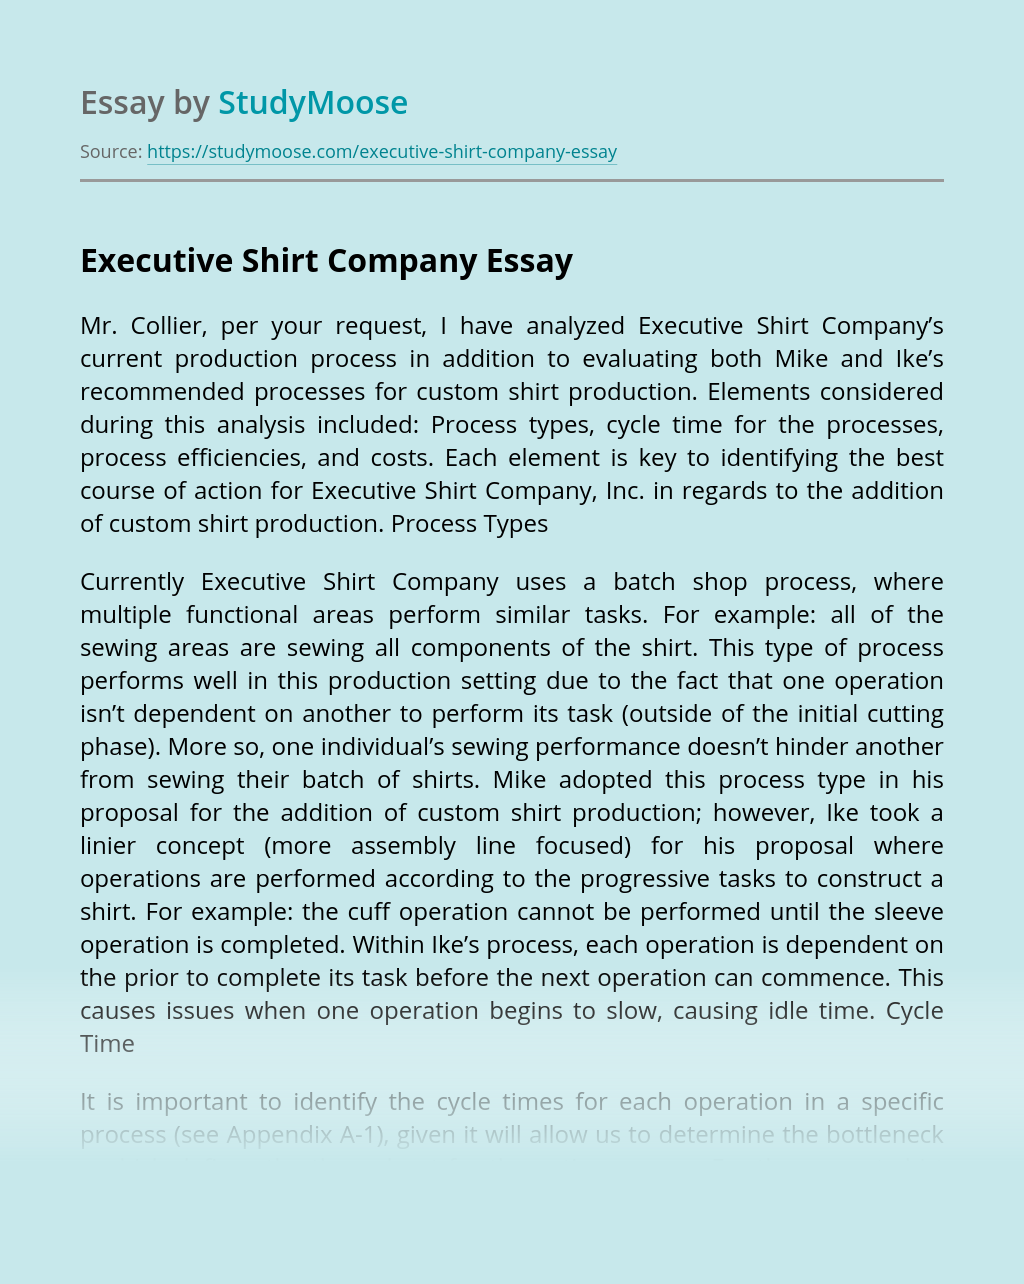 Executive Shirt Company